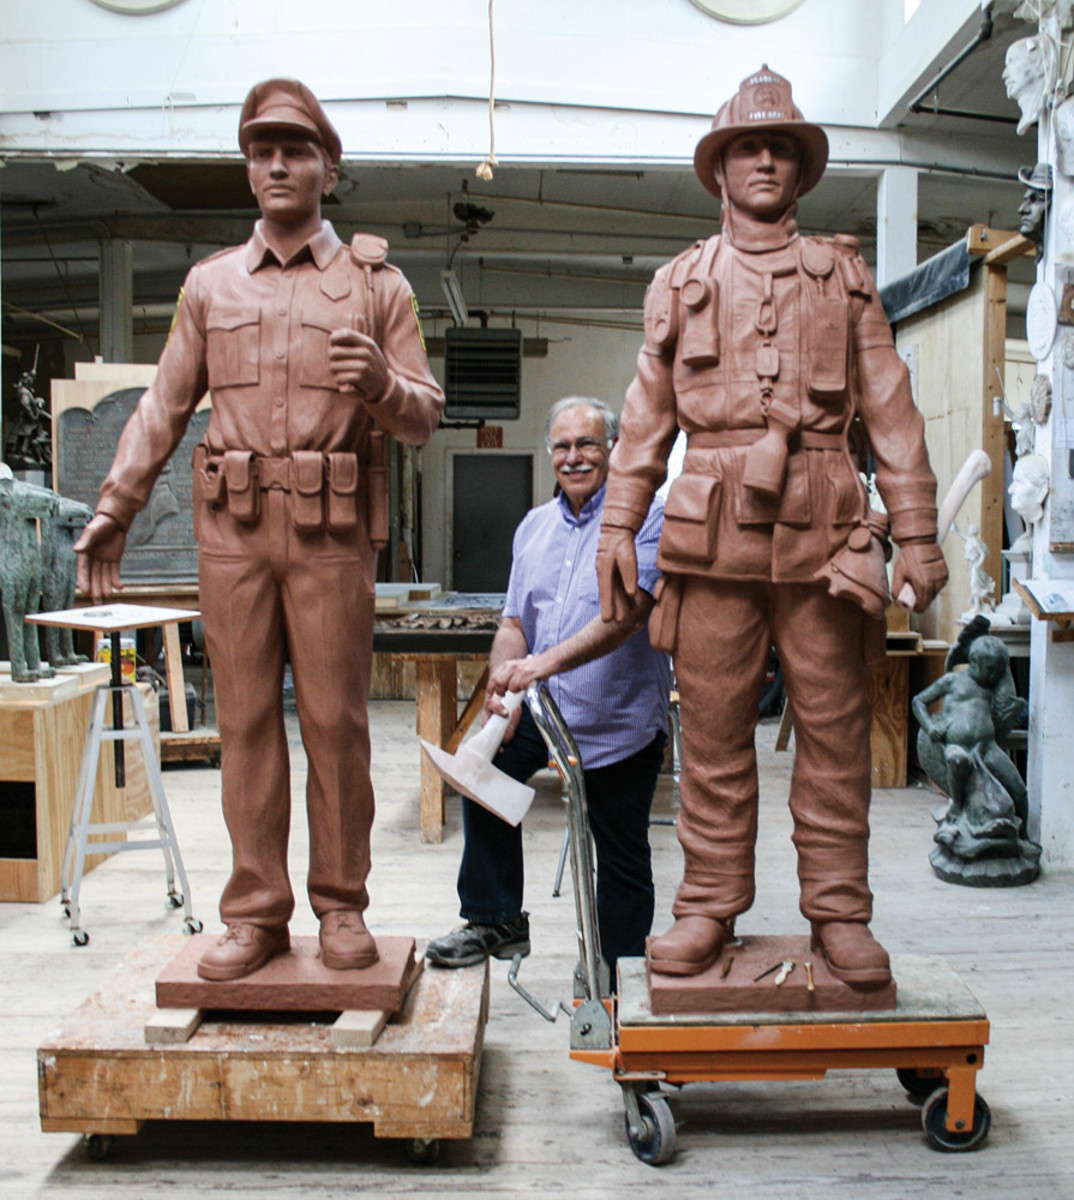 Robert Shure sculpting, sculpted memorial